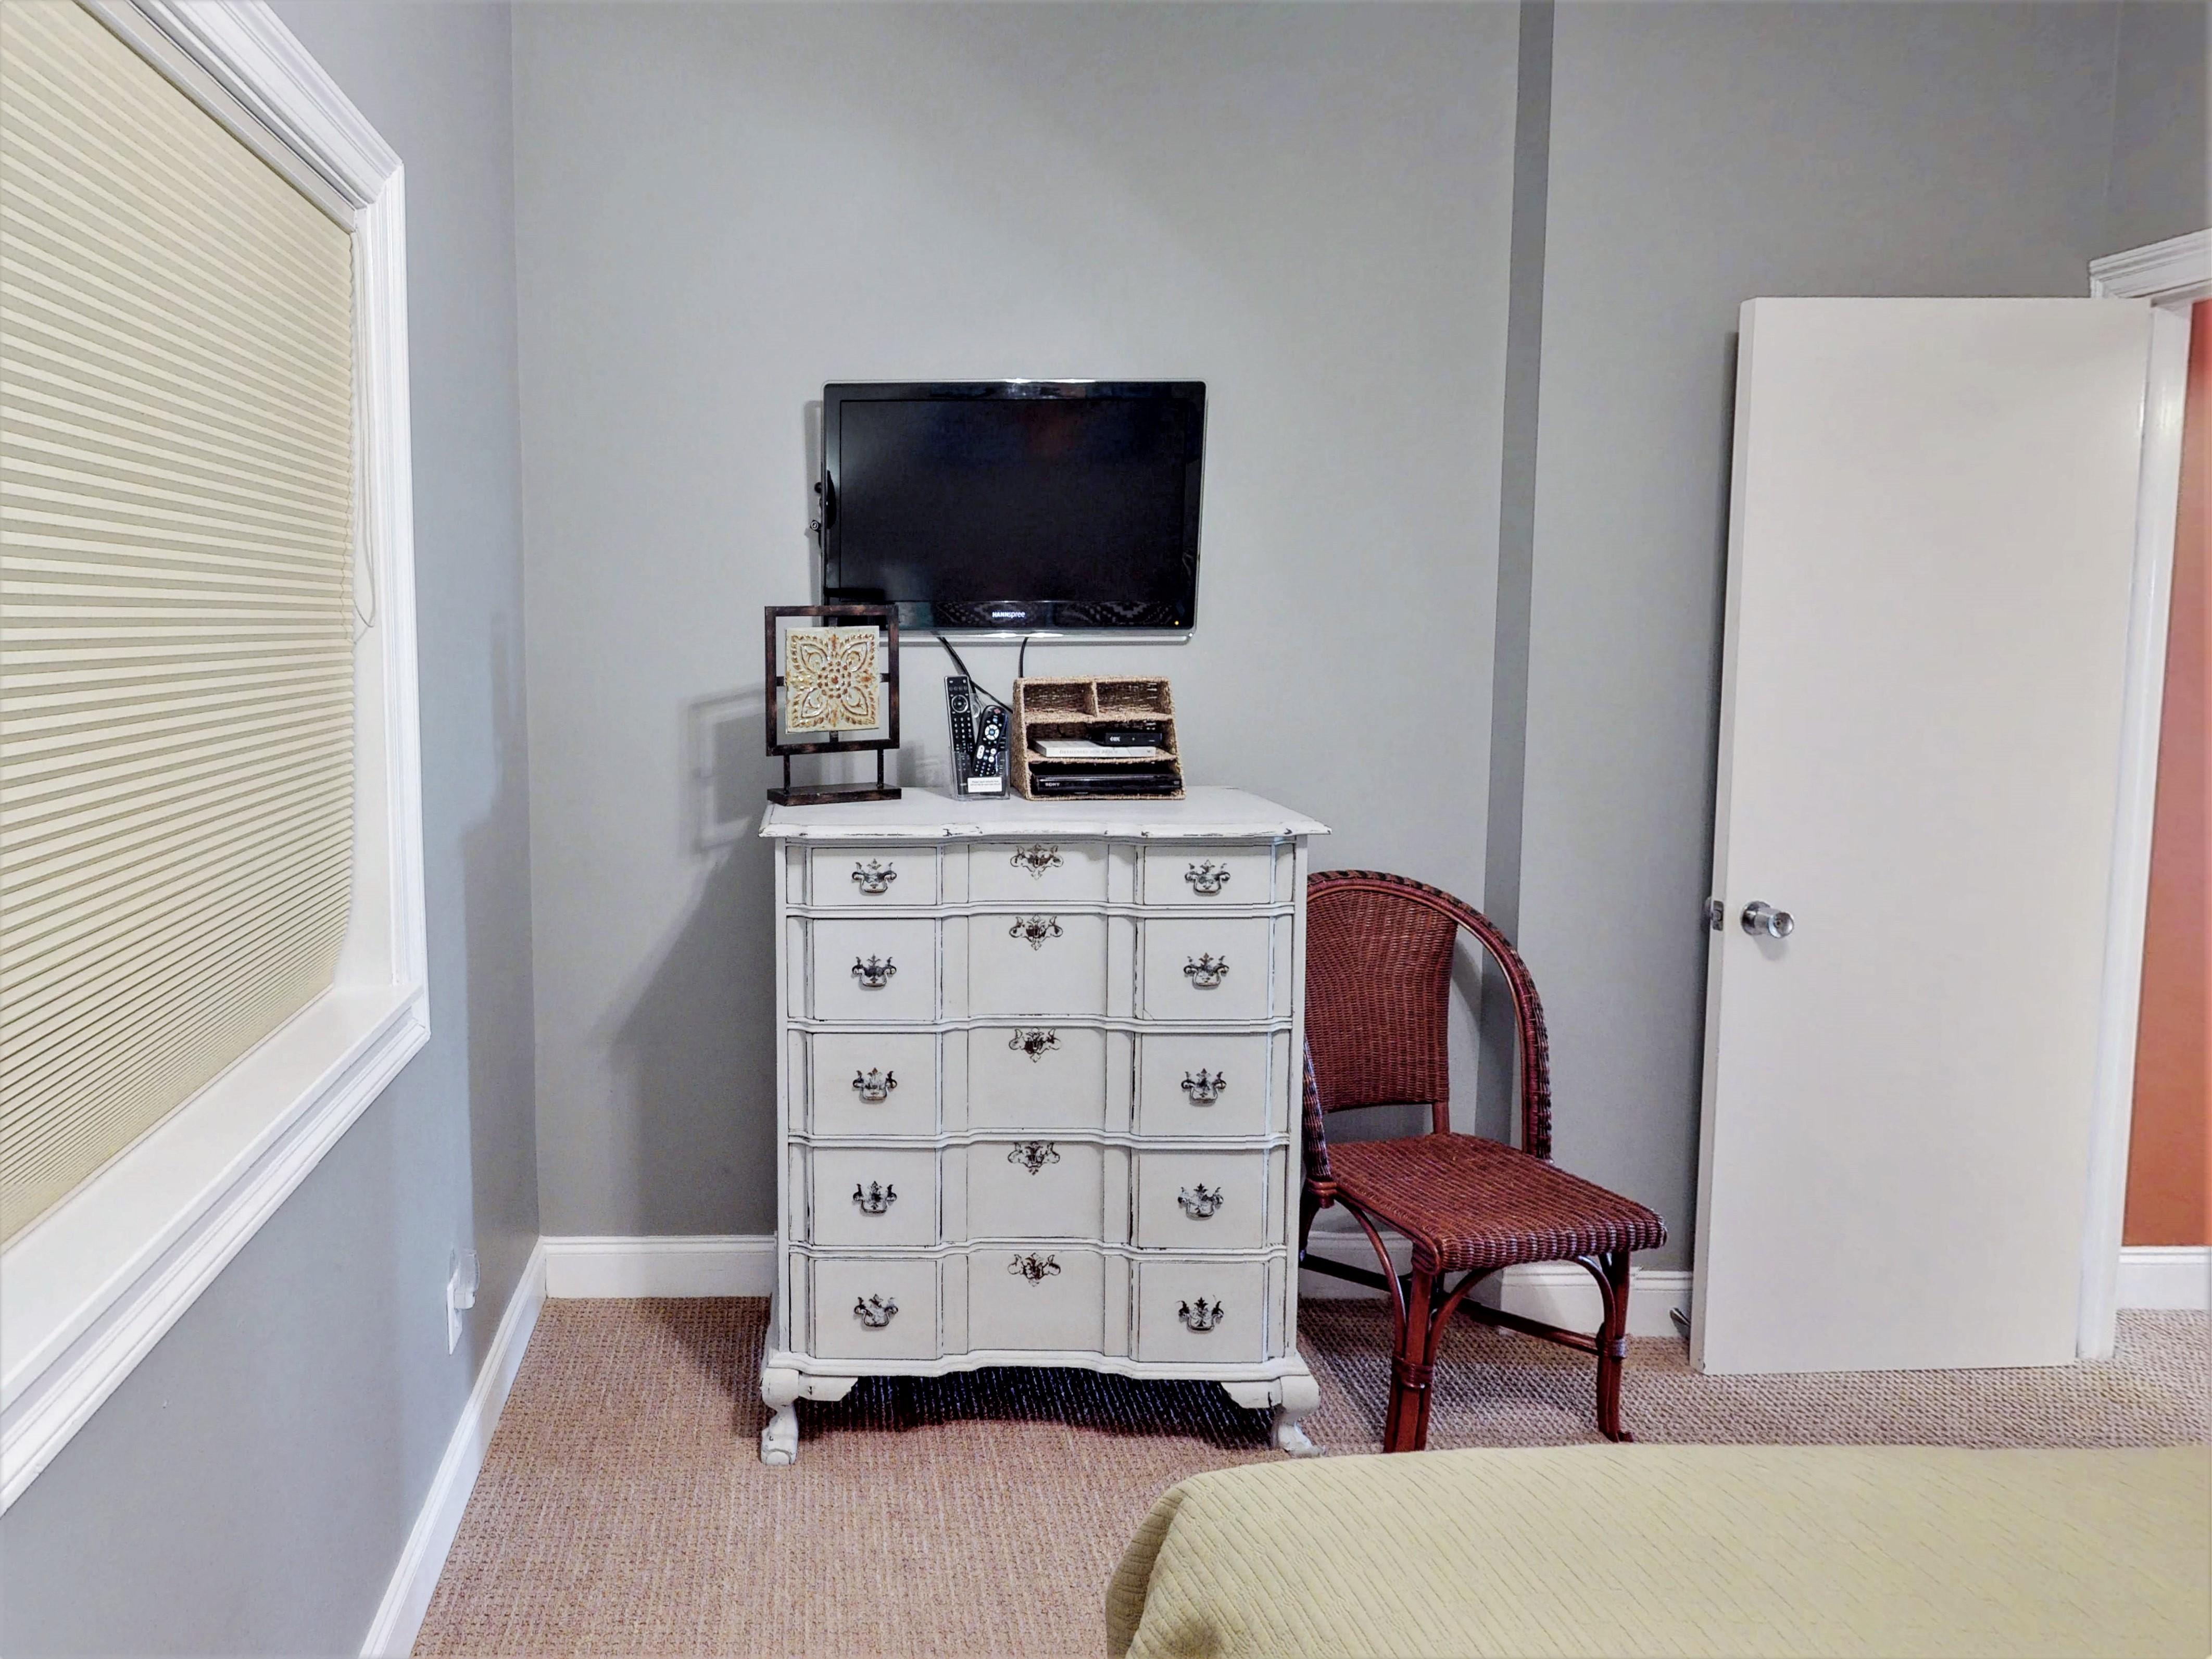 905 Tops'l Beach Manor Condo rental in TOPS'L Beach Manor  in Destin Florida - #16